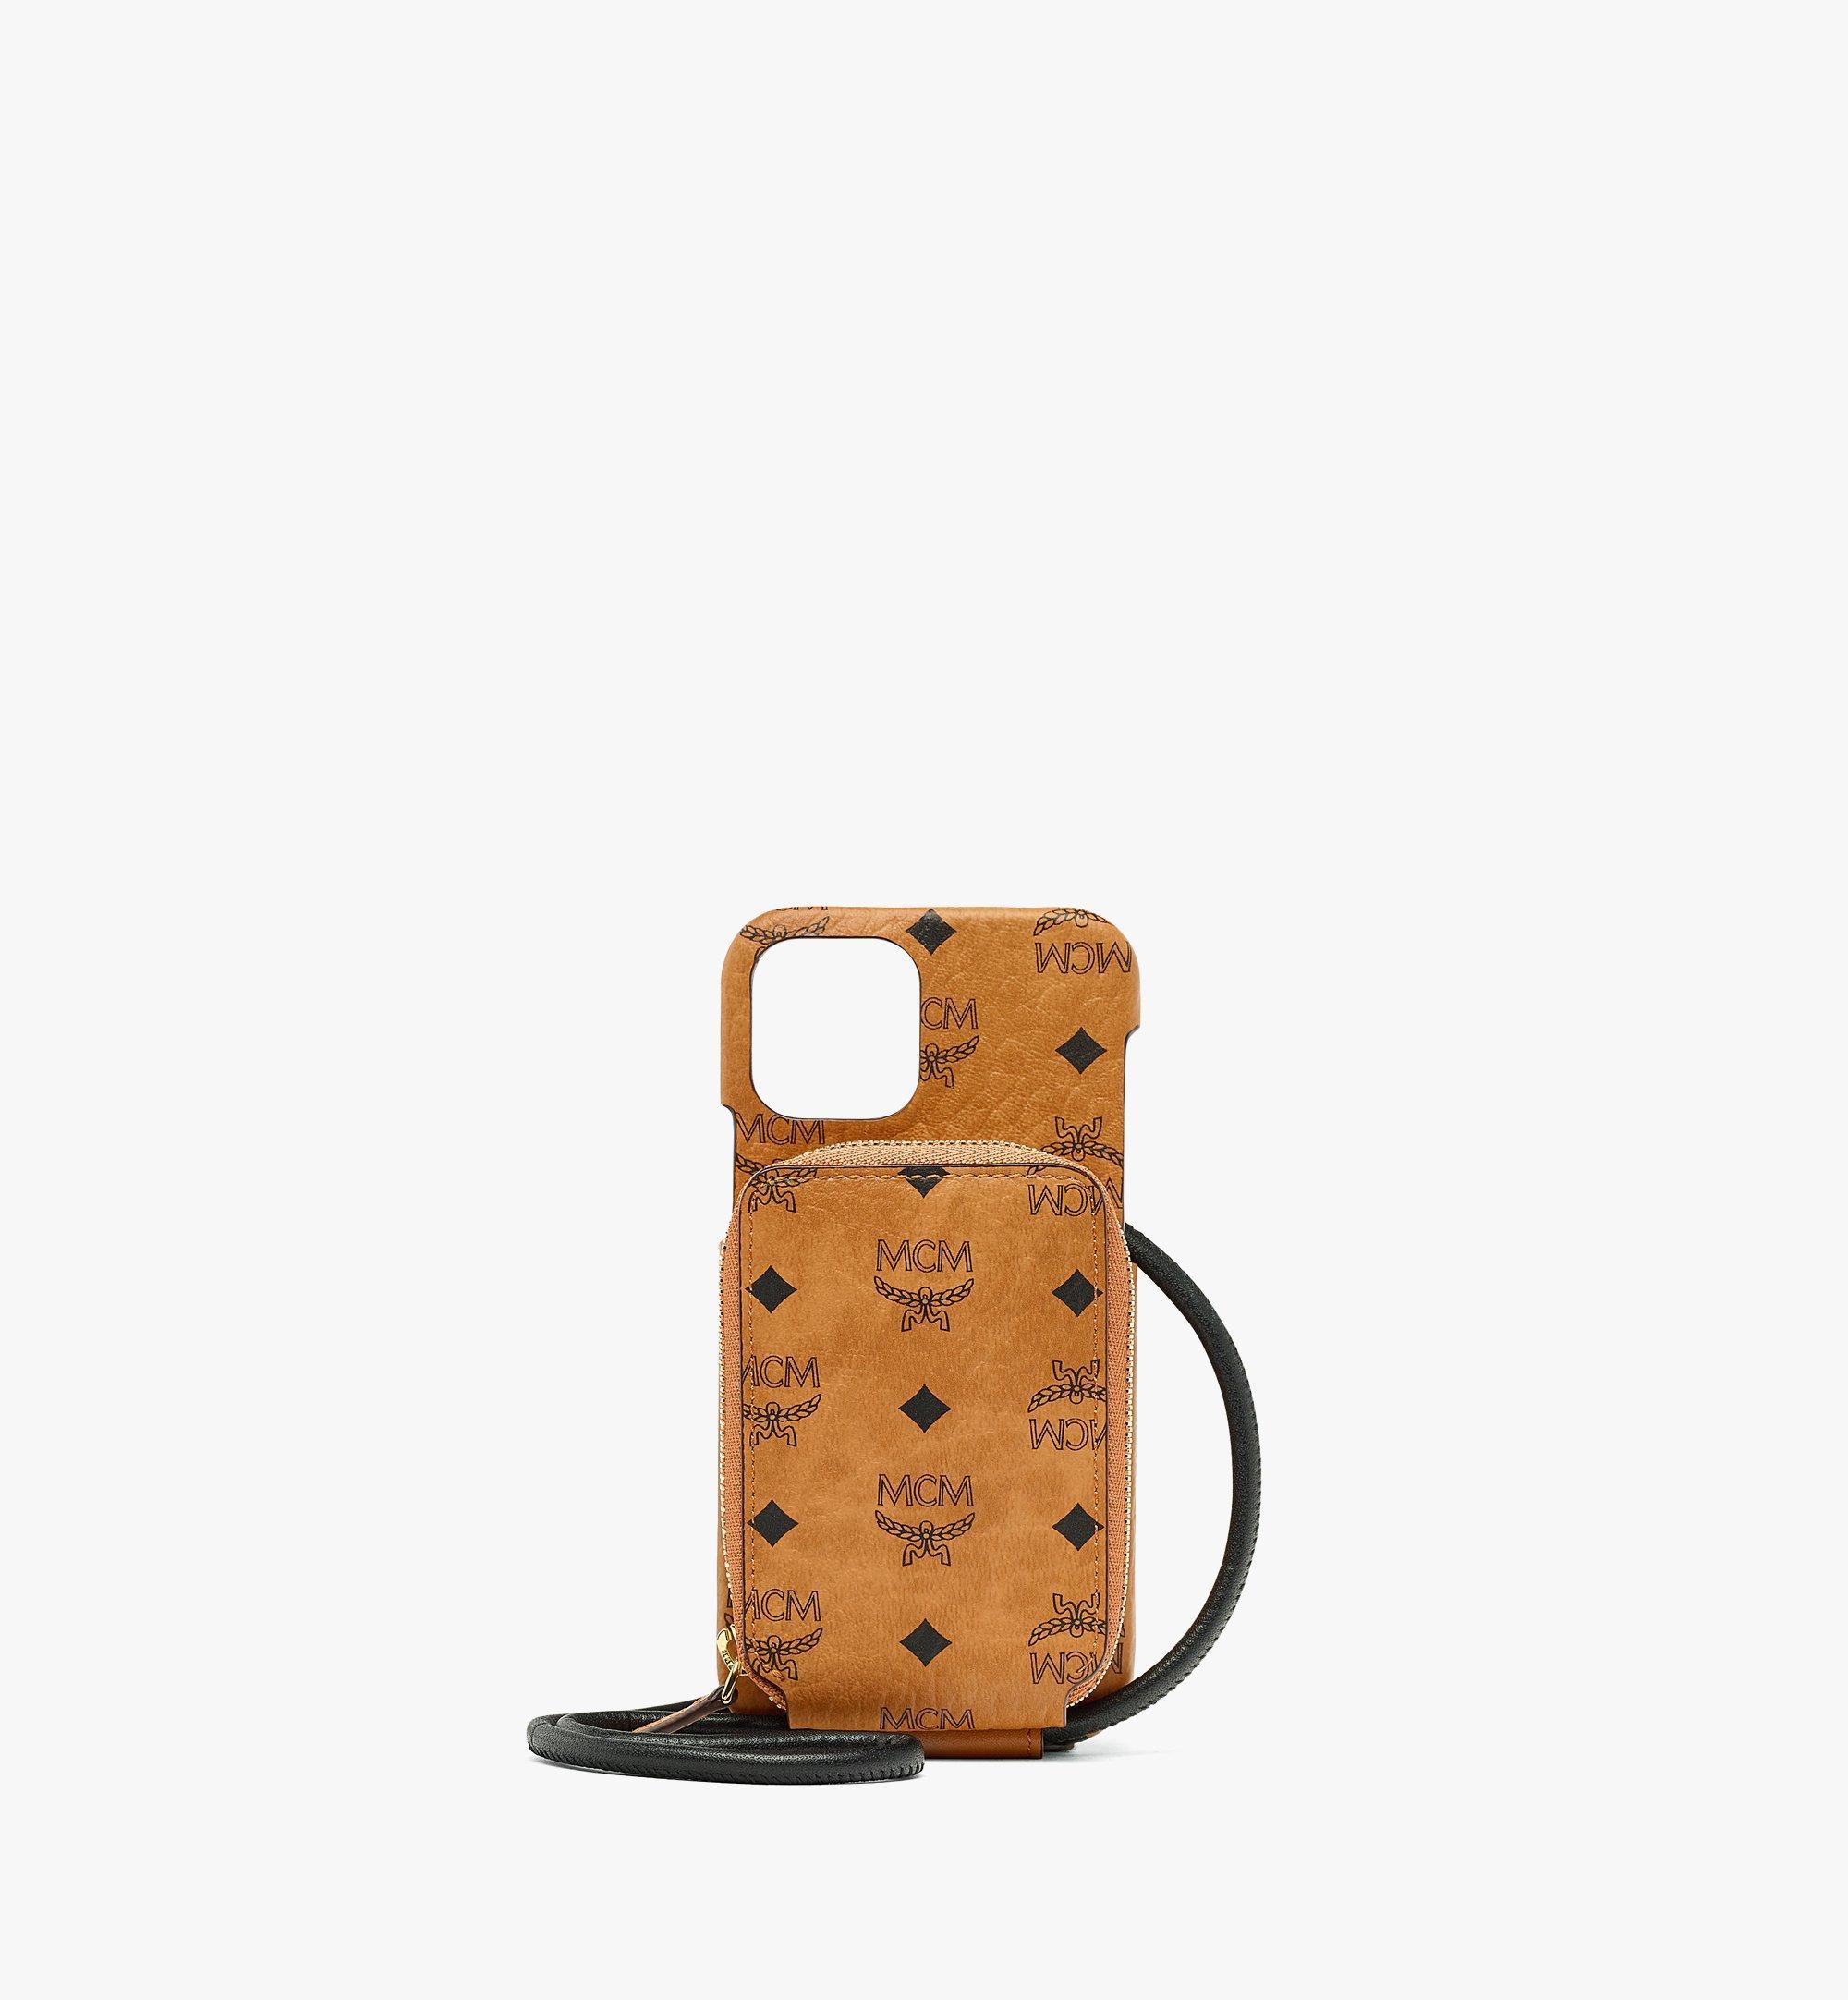 MCM iPhone 12/12 Pro Case with Zip Pocket in Visetos Original Cognac MXEBAVI01CO001 Alternate View 1